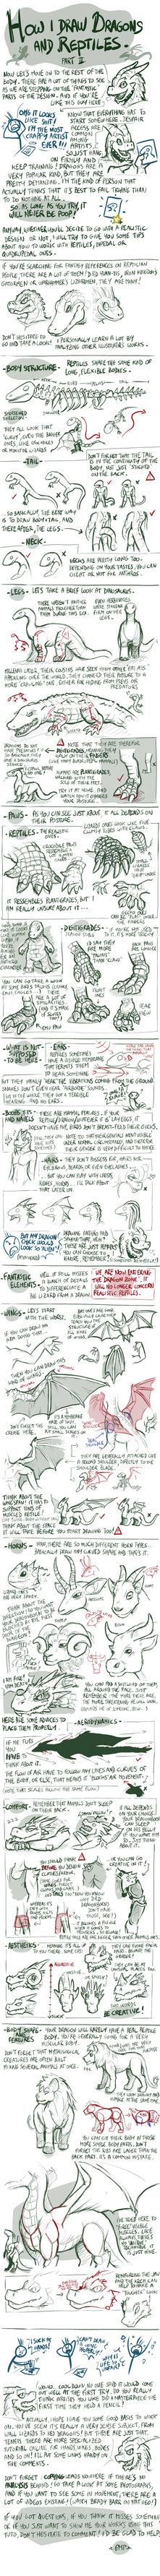 Tuto - How I draw reptiles/dragons - Part 2 by EMP-83.deviantart.com on @DeviantArt